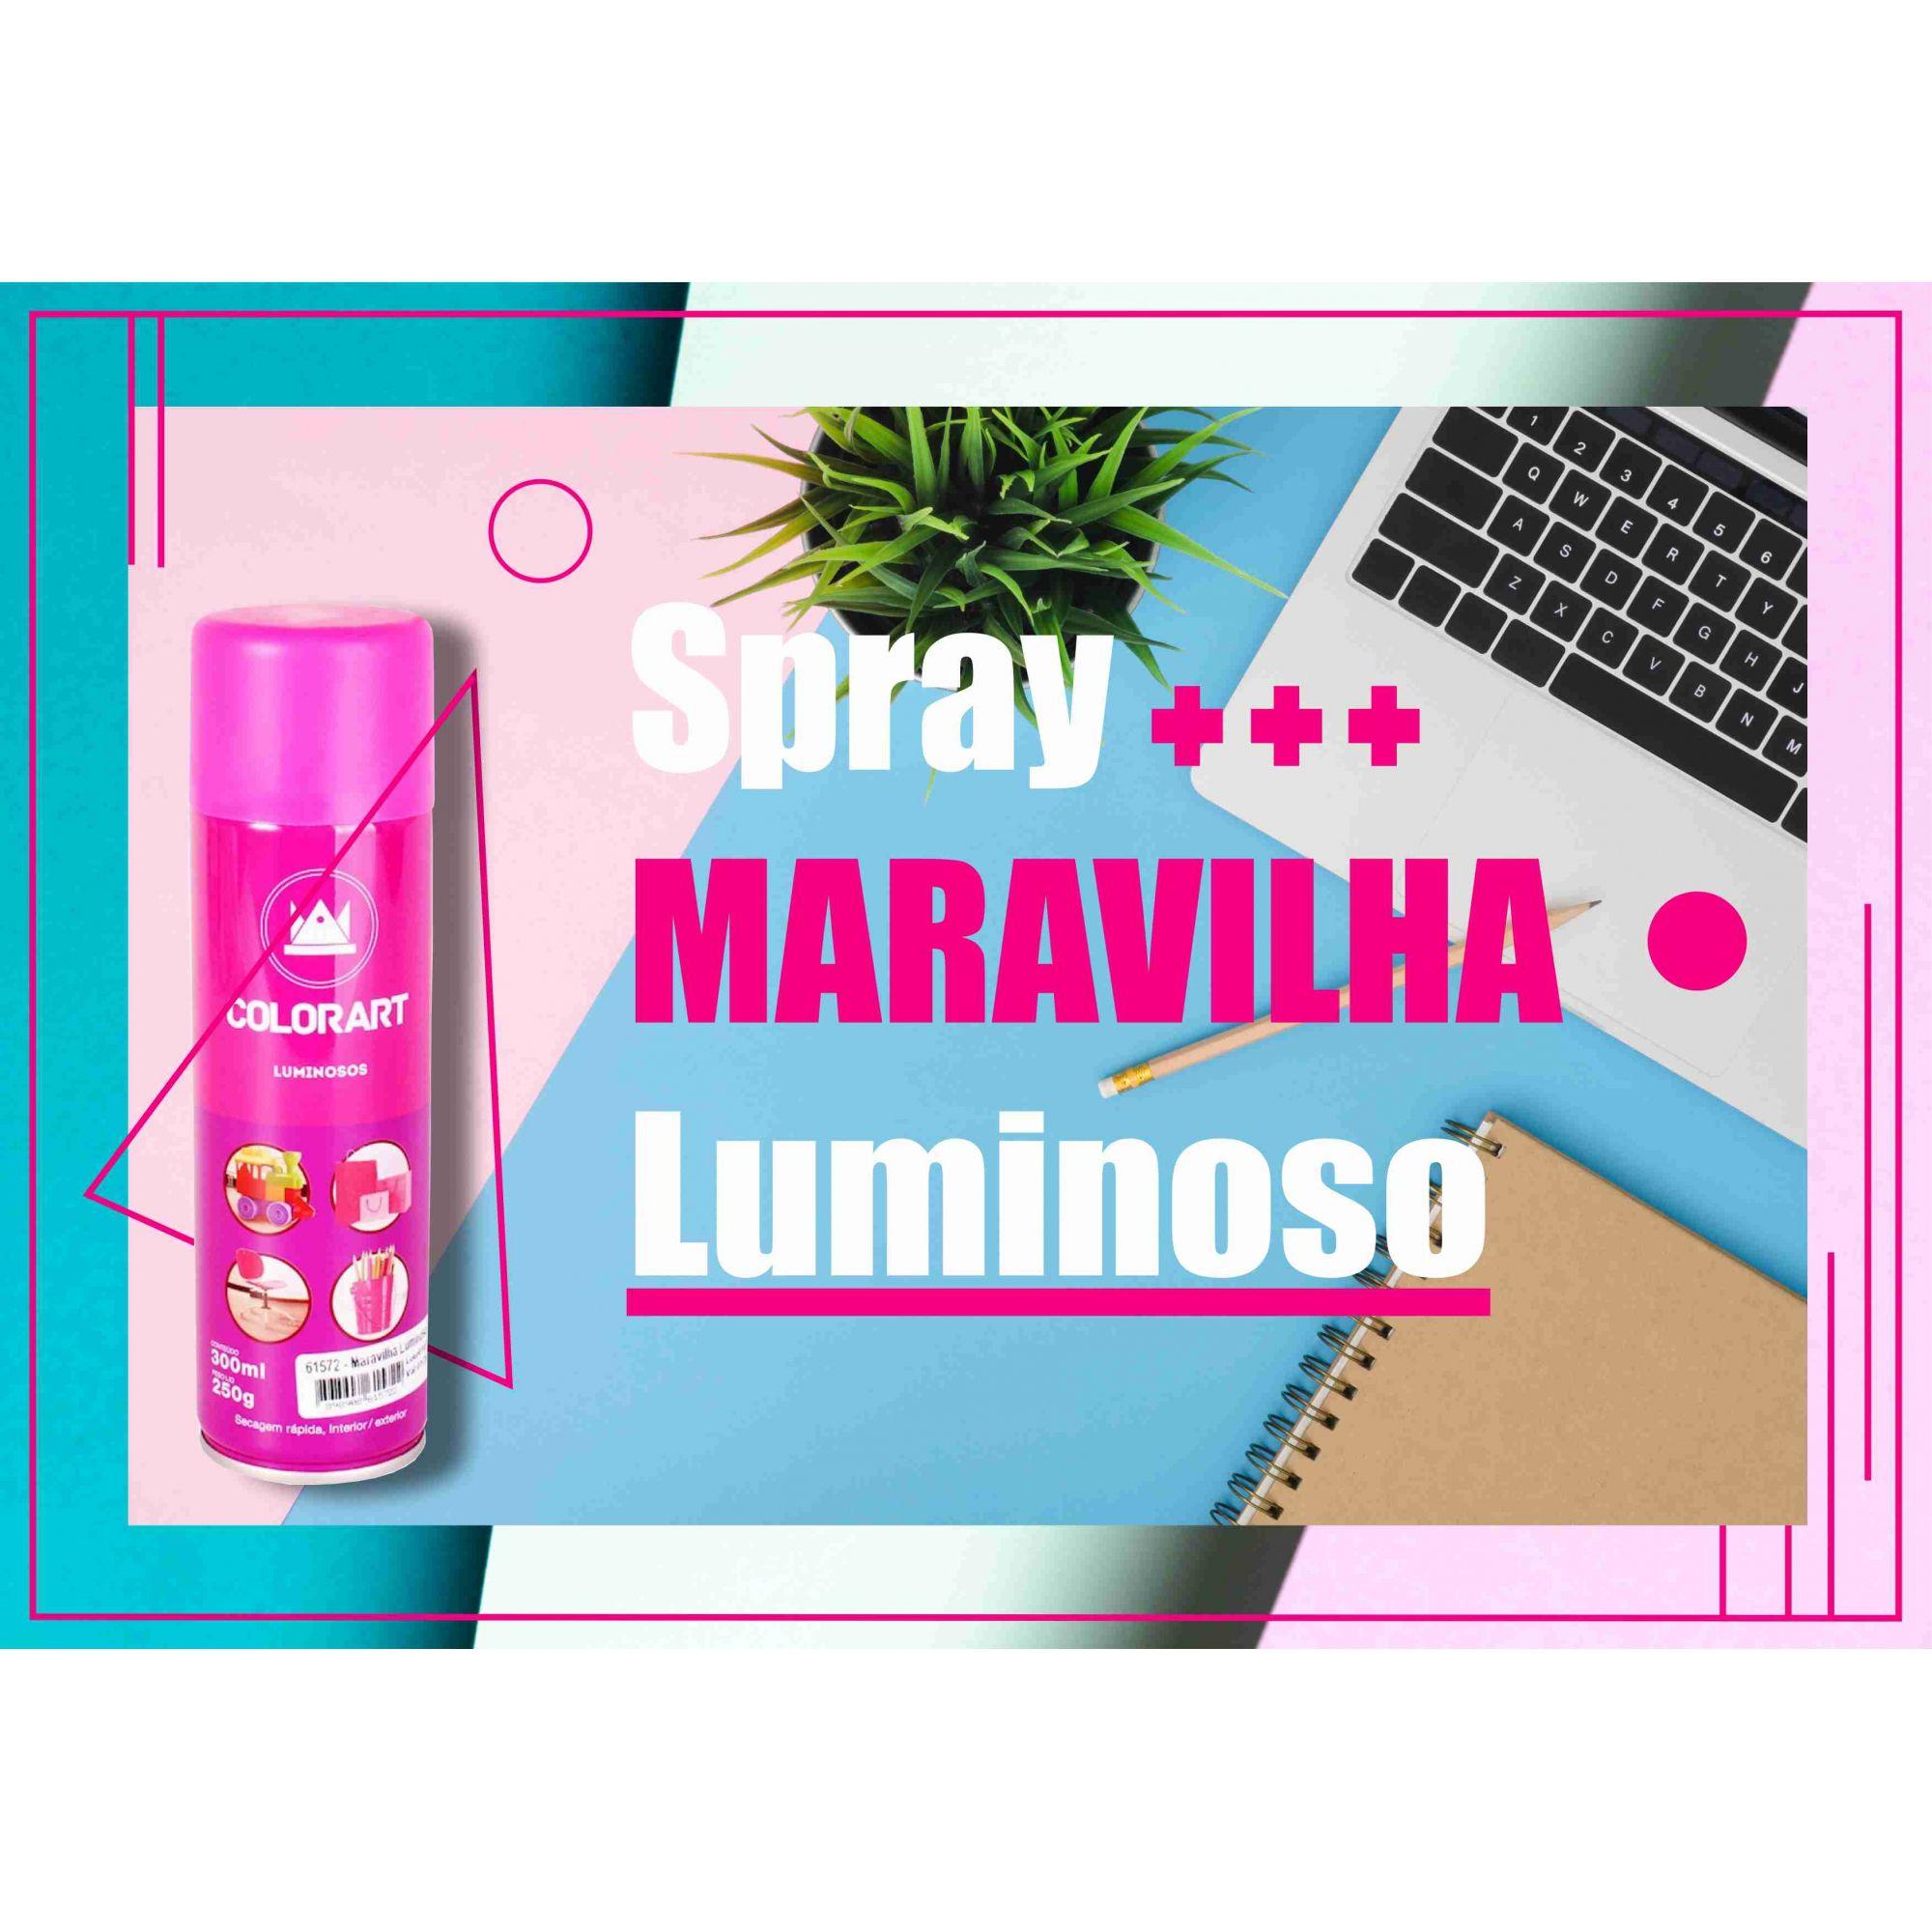 Tinta Spray Colorart  Maravilha Luminoso  - Rea Comércio - Sua Loja Completa!